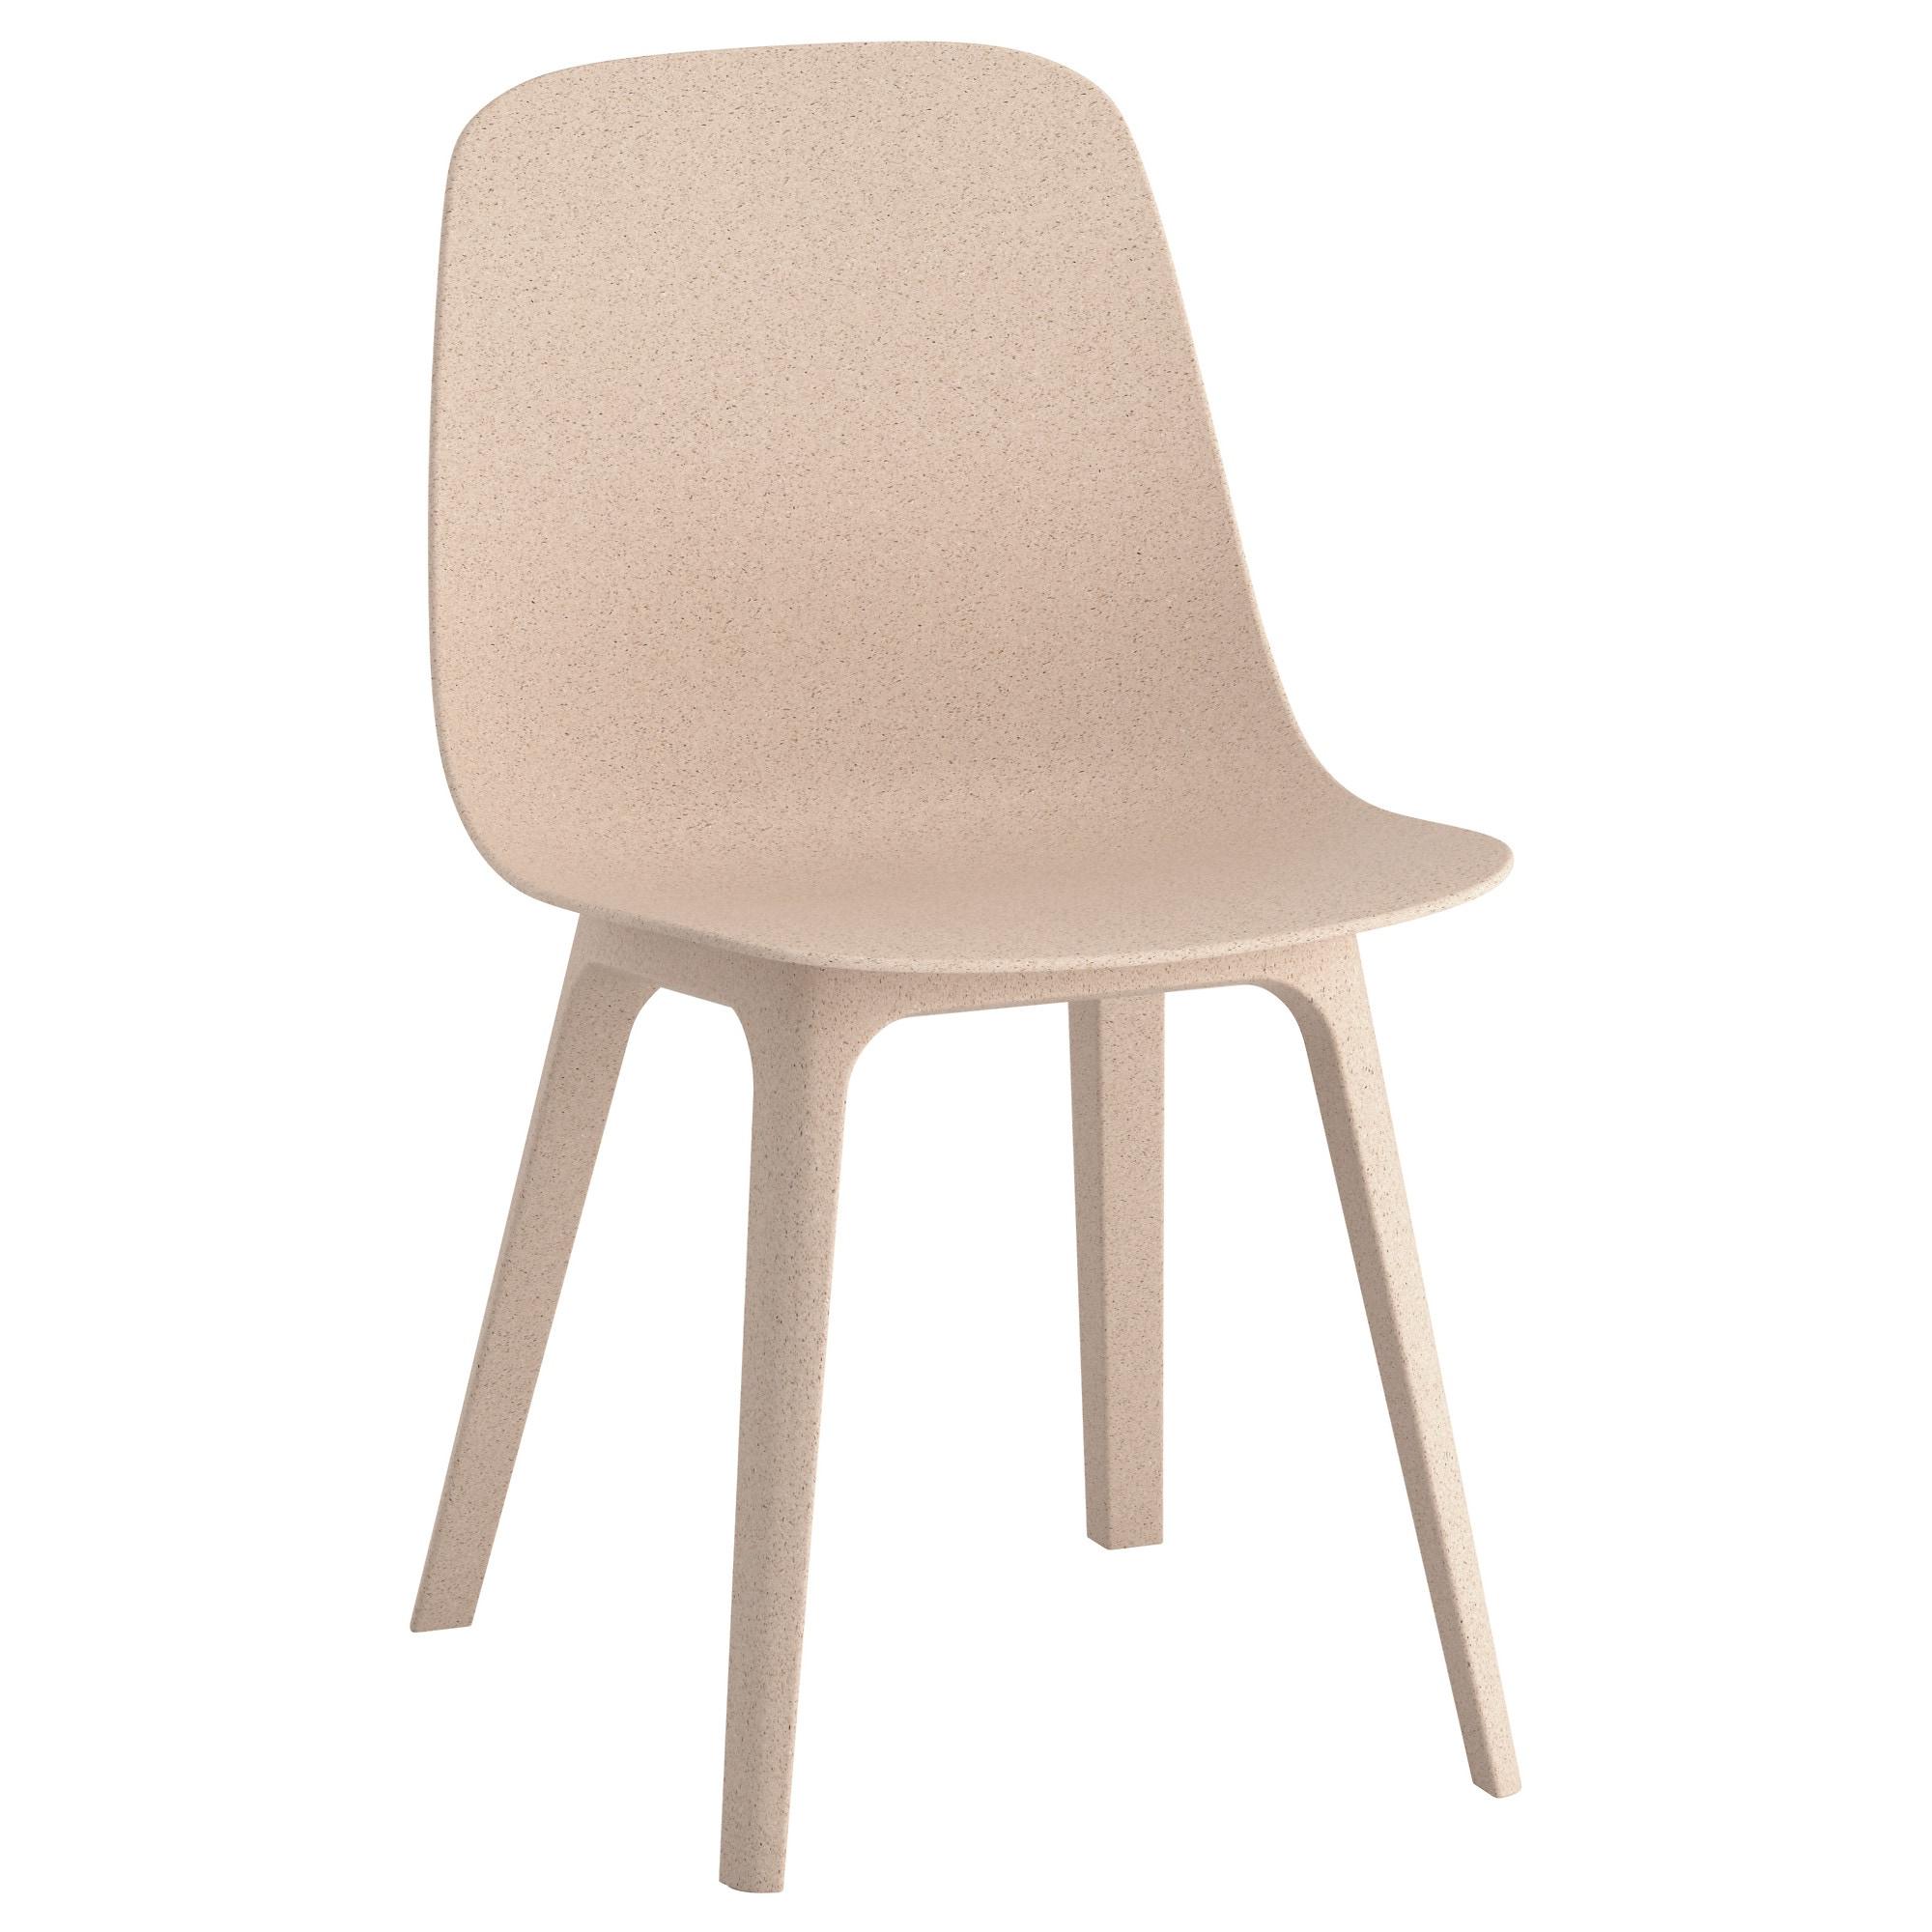 Silla Cocina Ikea 4pde Odger Silla Blanco Beige Ikea